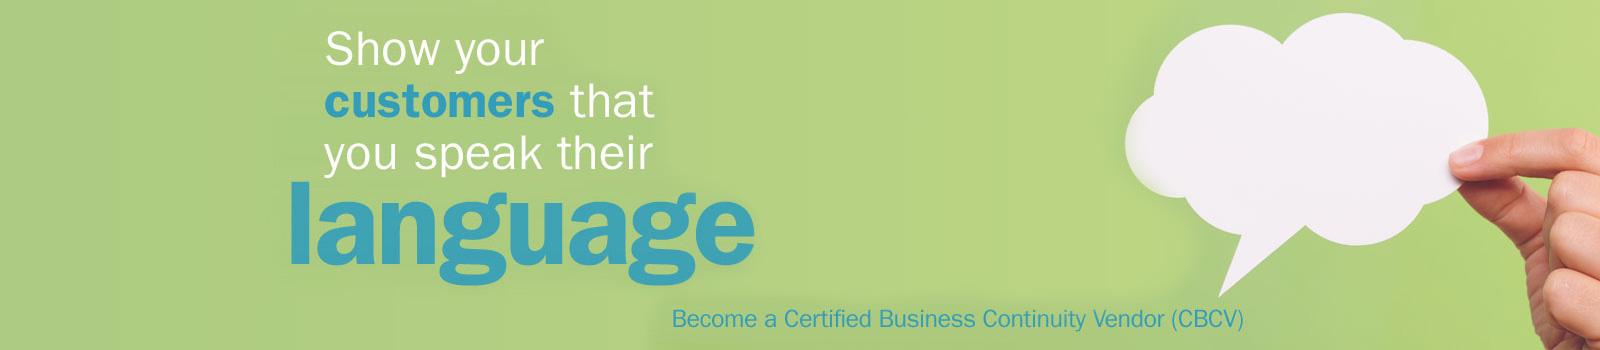 CBCV Certification Image